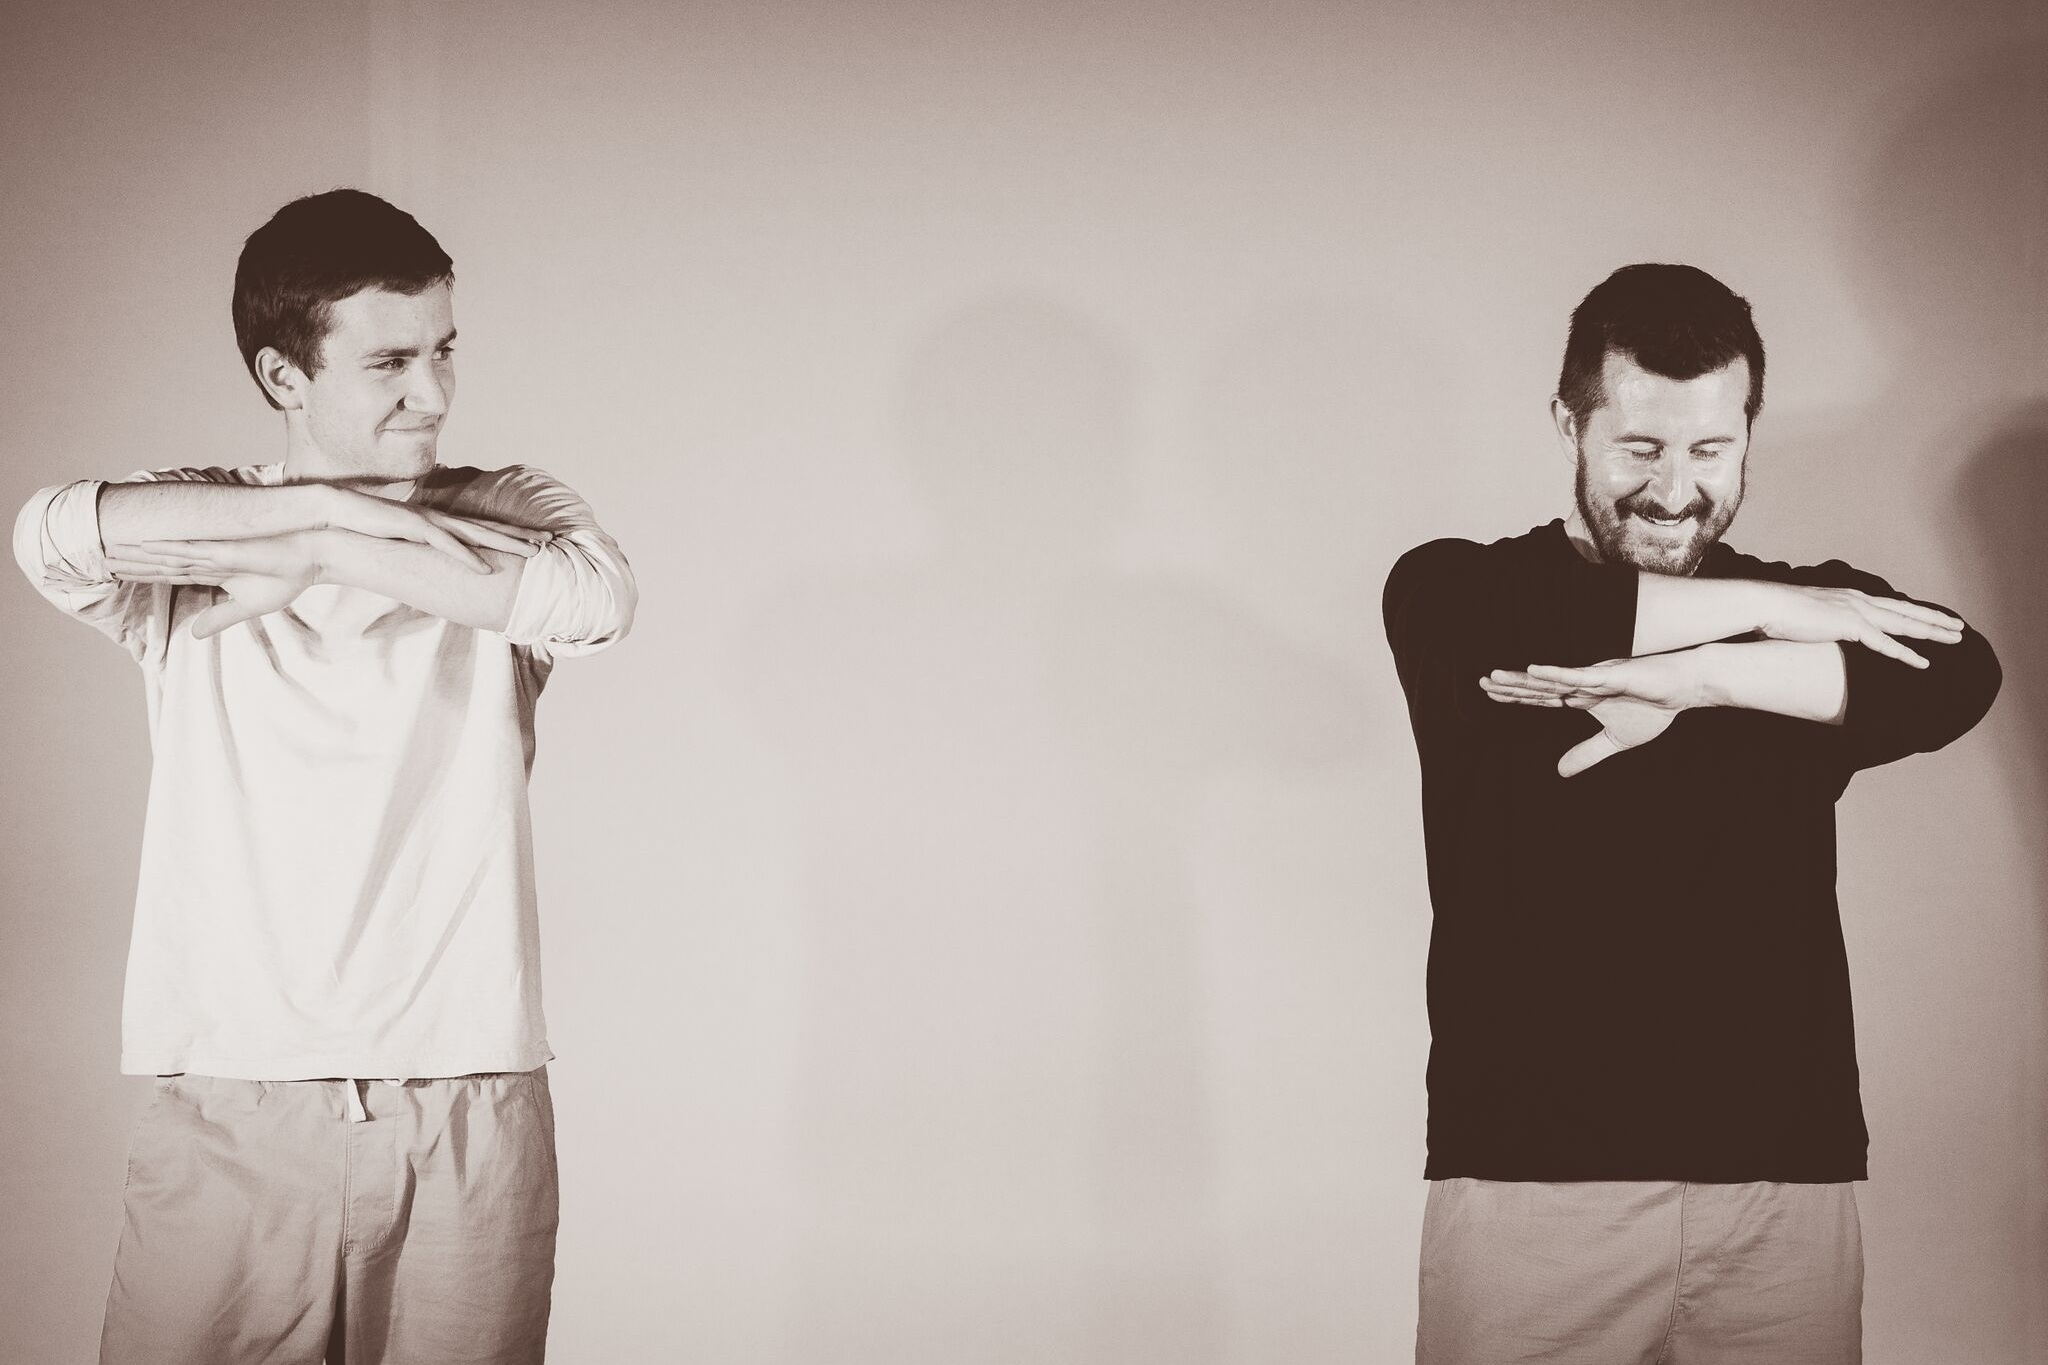 June 2016 - Tom Crean's Journey: An Irish Dance Expedition